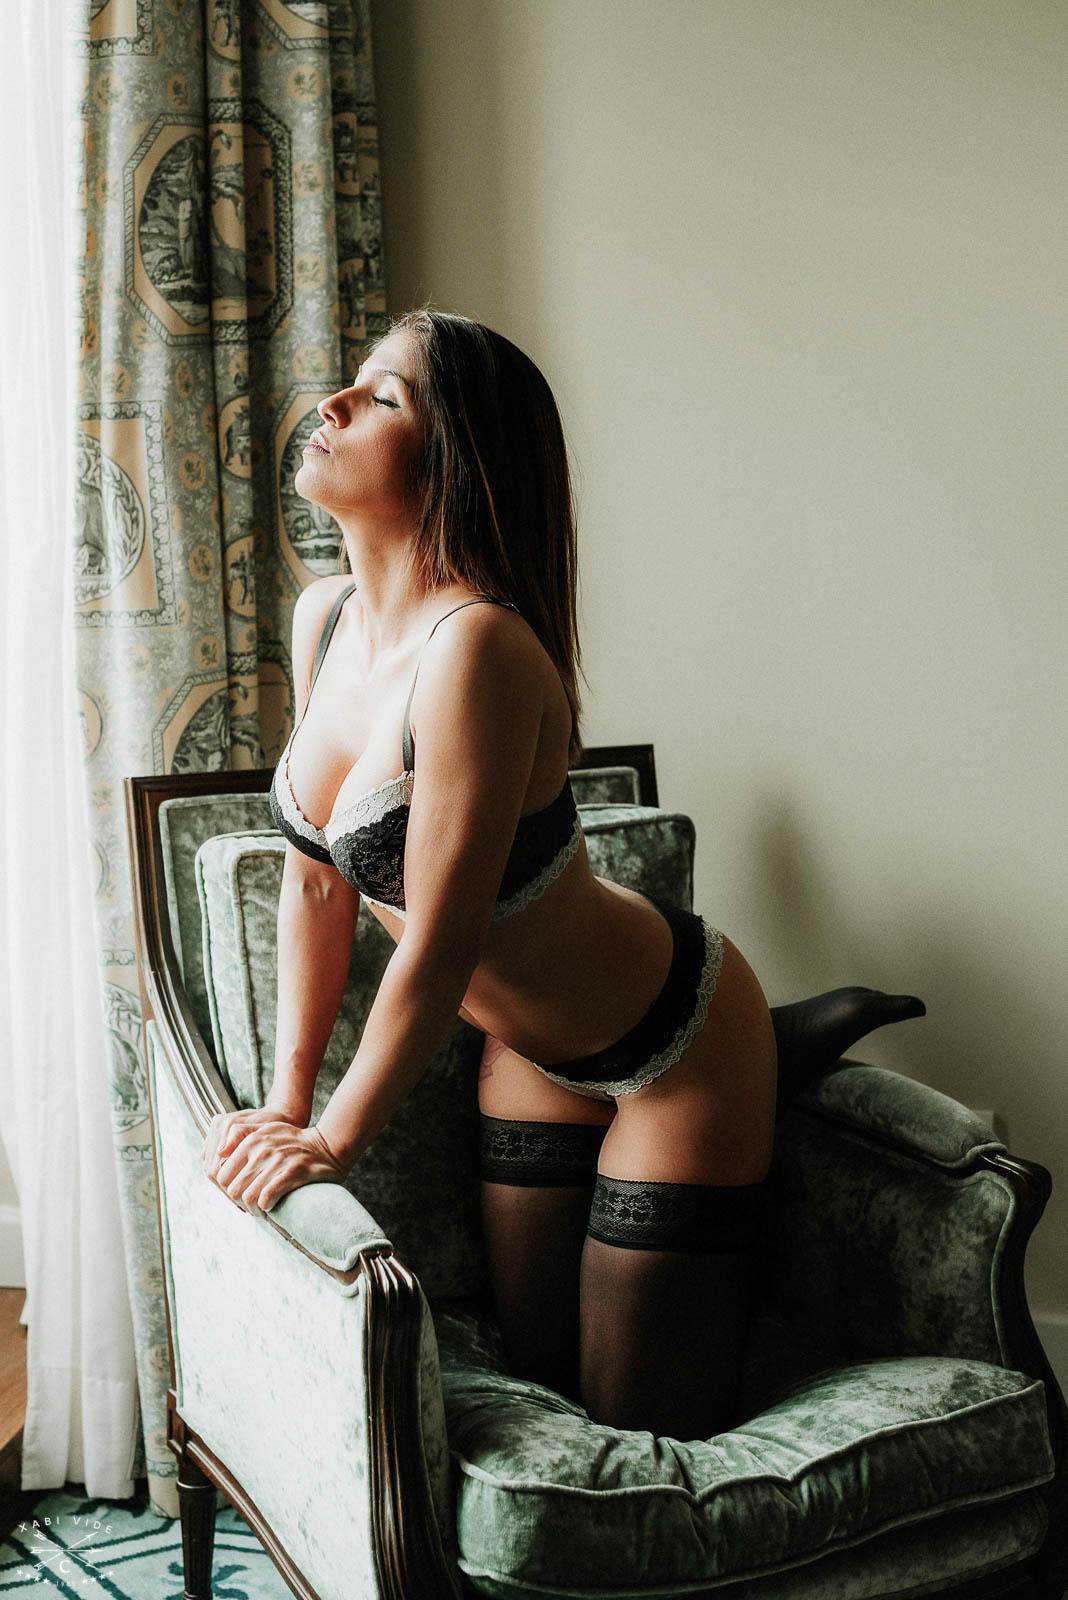 fotografía boudoir-22